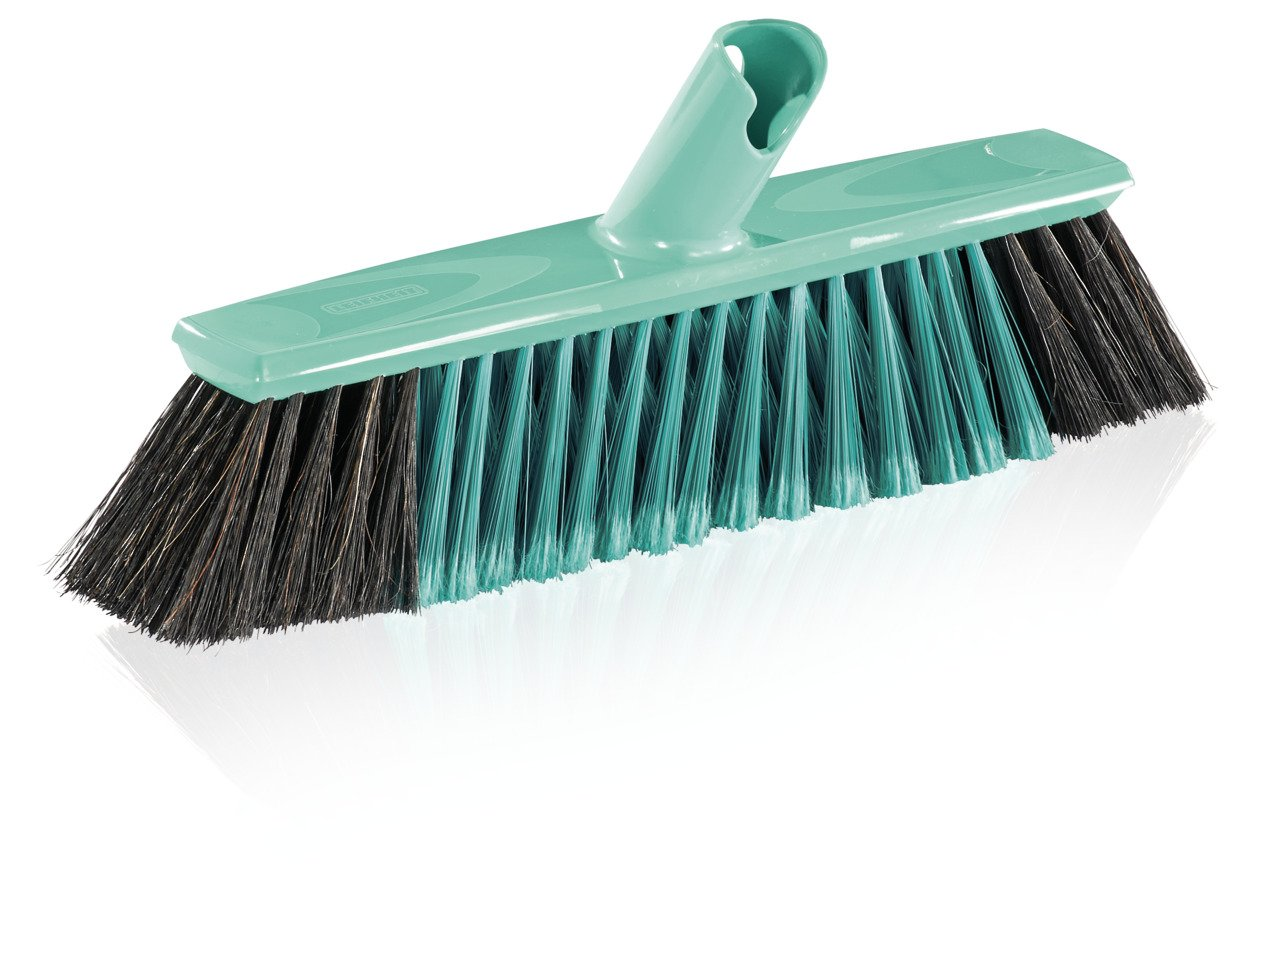 Leifheit 45031 Allround Broom Head Xtra Clean, 40 cm